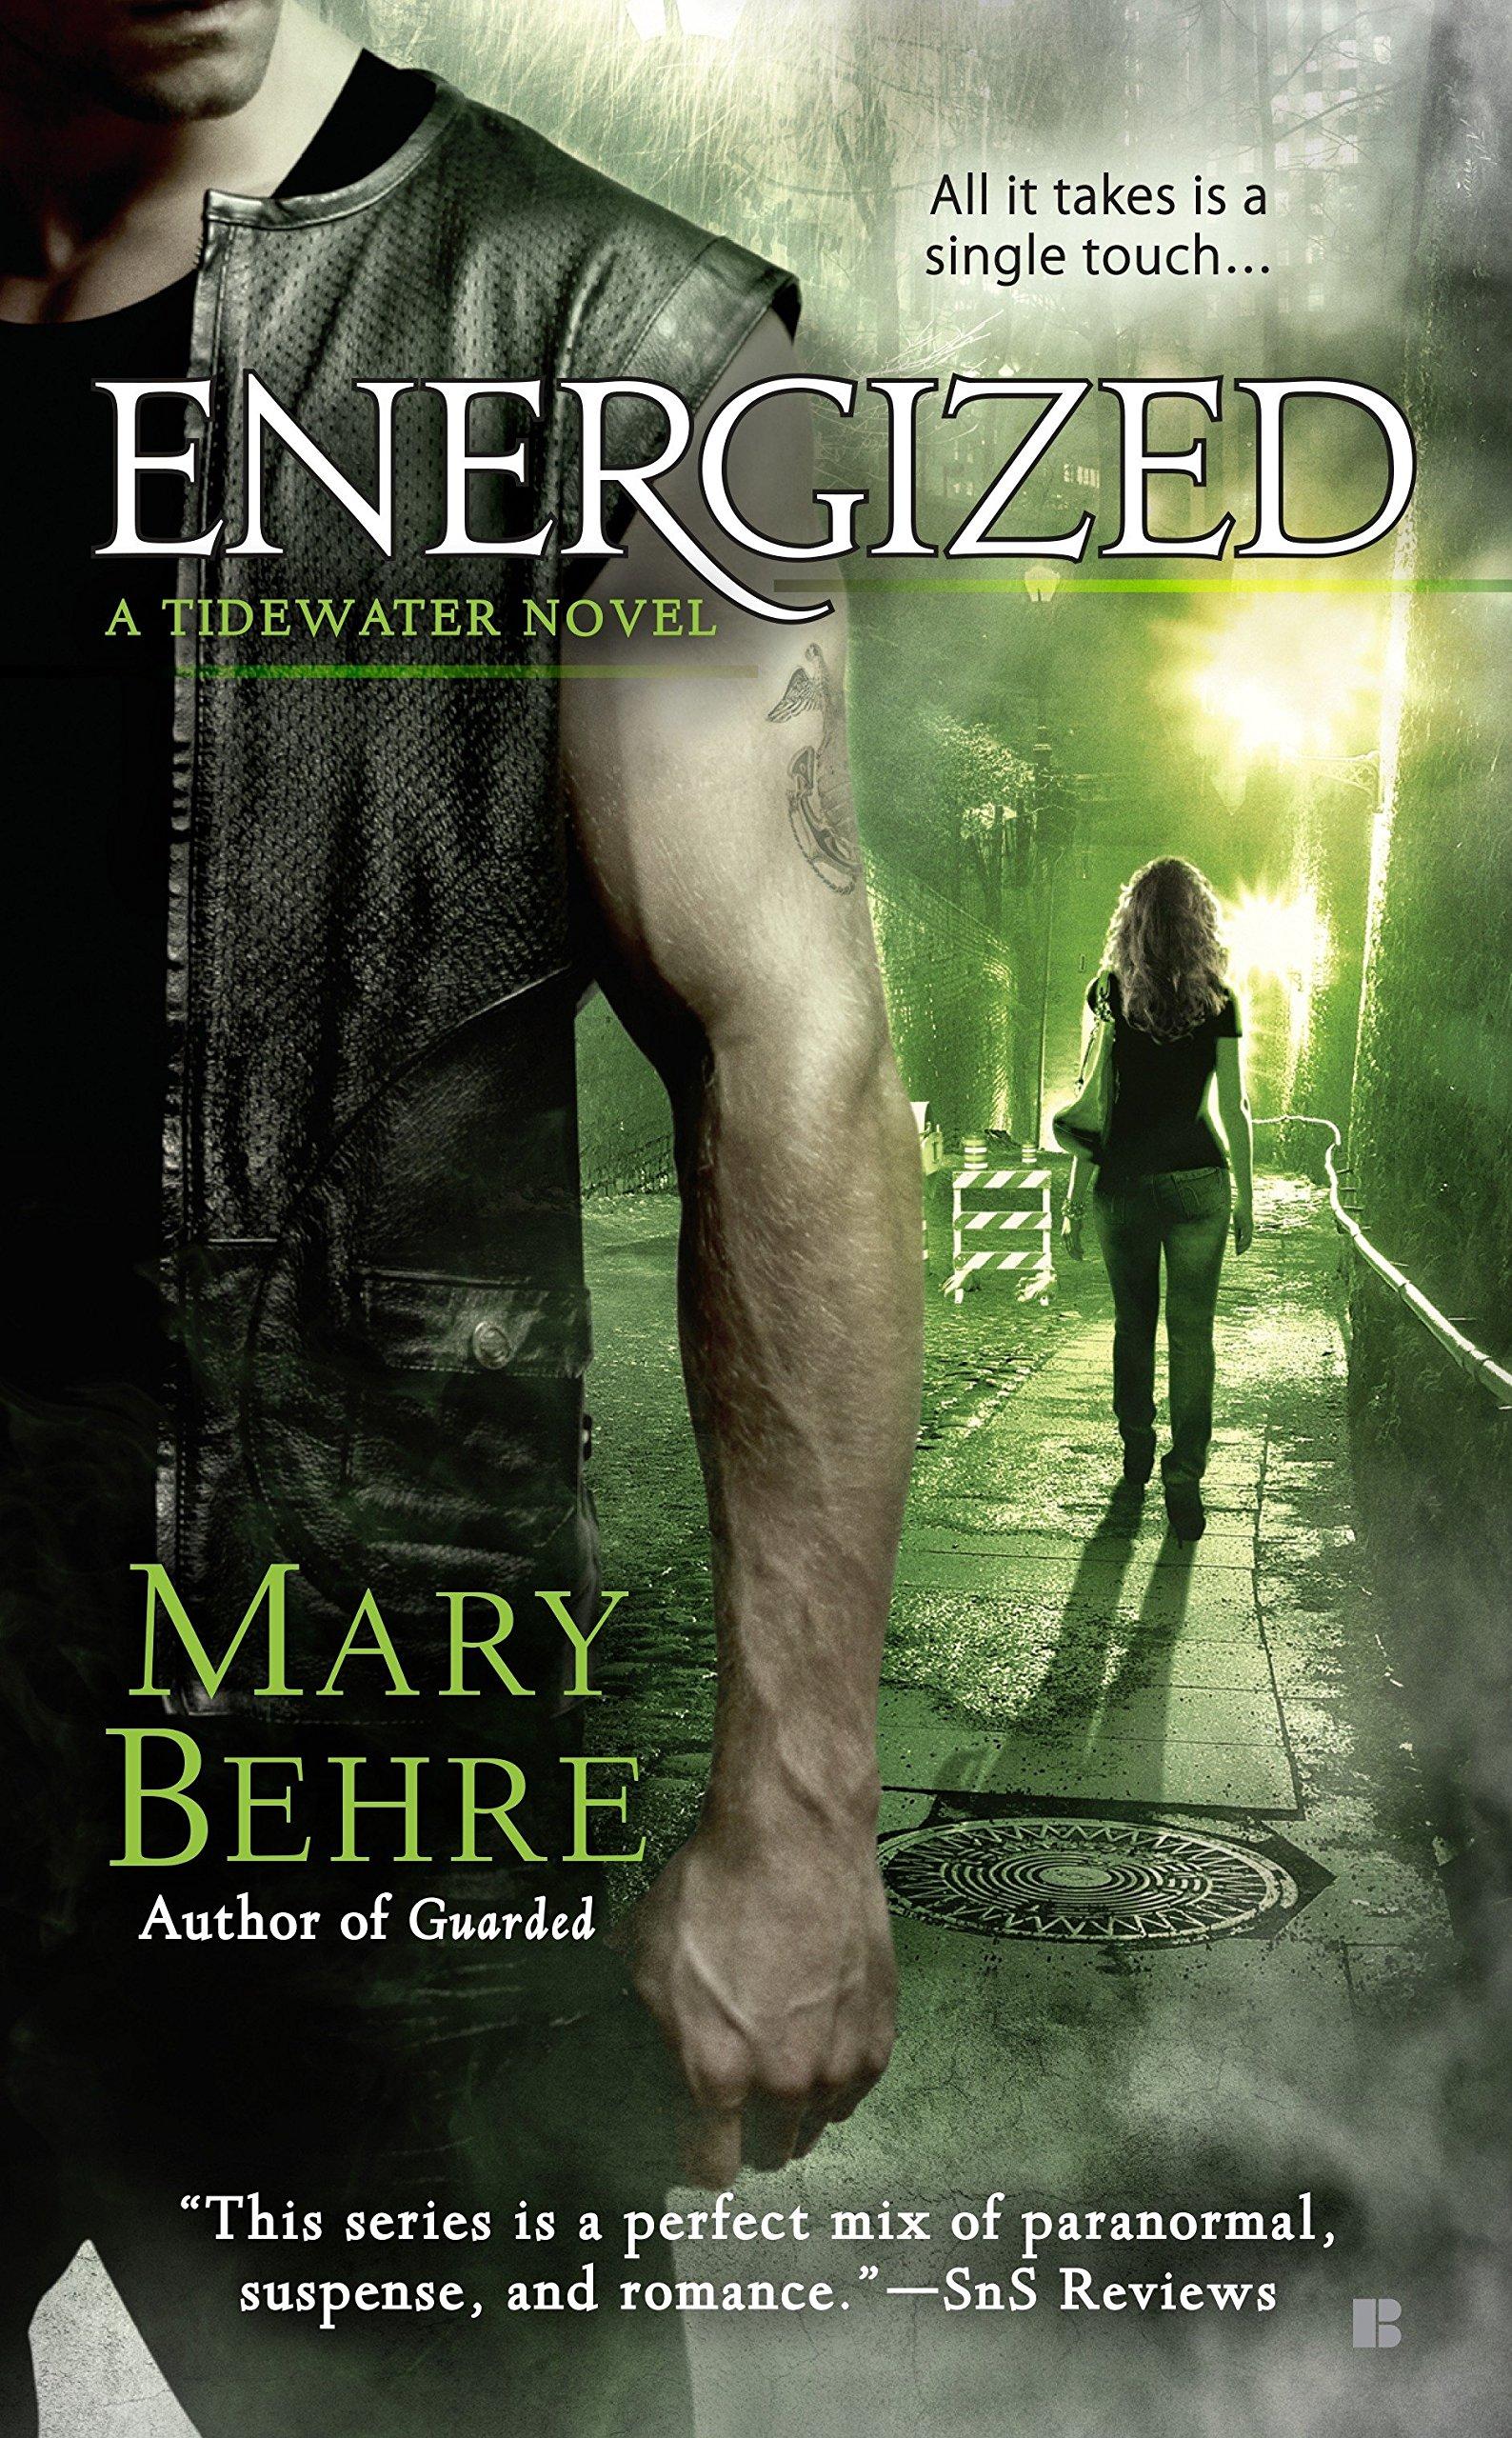 cbef1feb2a Amazon.fr - Energized - Mary Behre - Livres